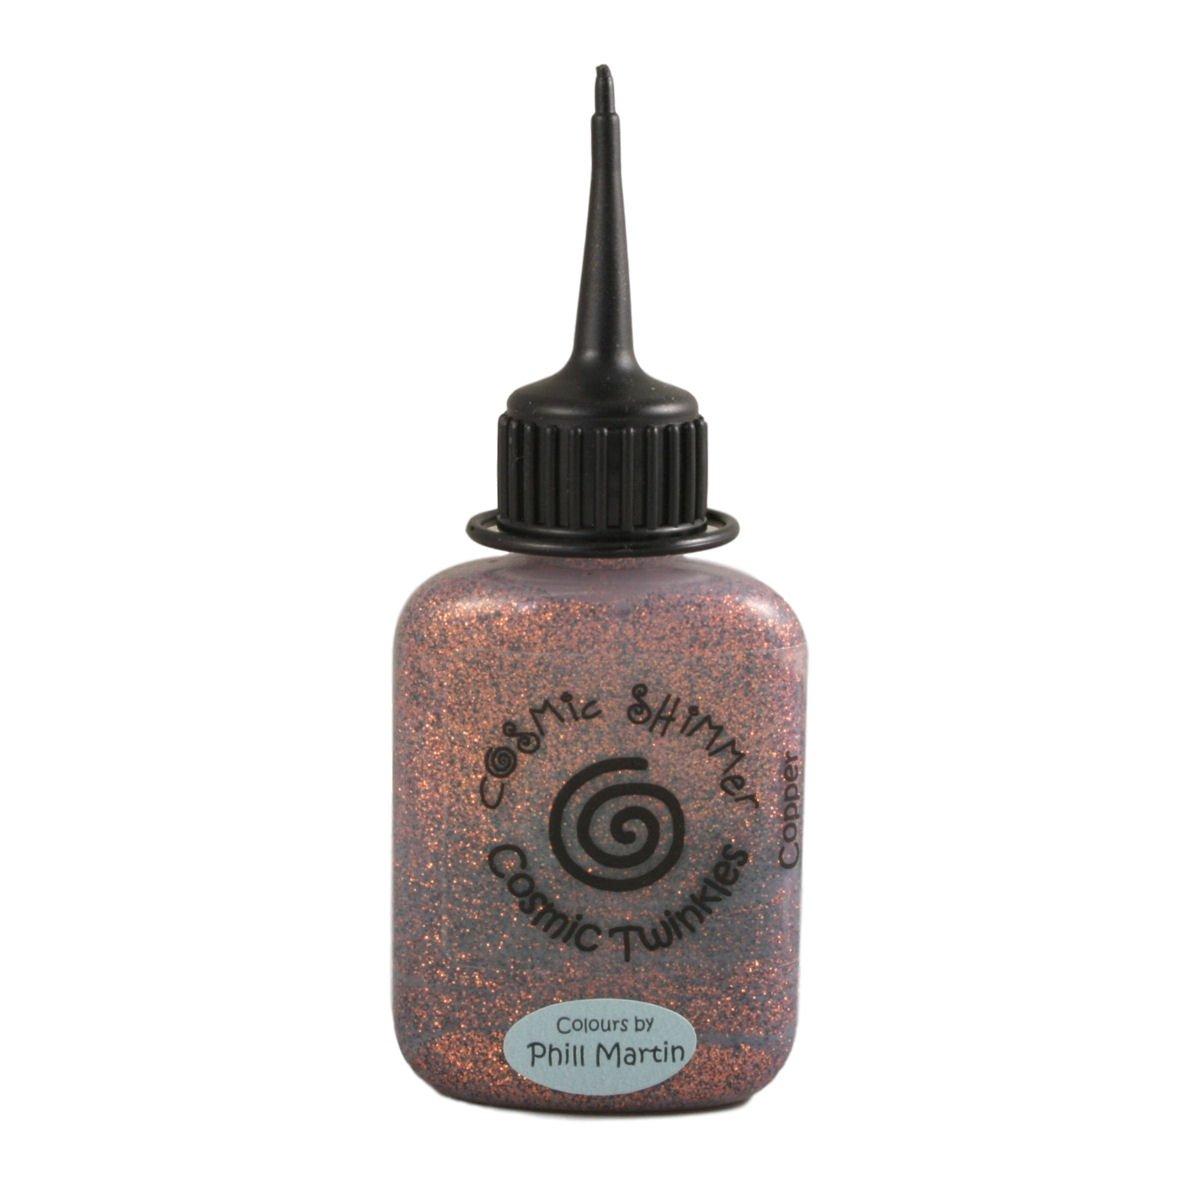 Cosmic Shimmer Twinkles Glitter Glue 30ml - Copper